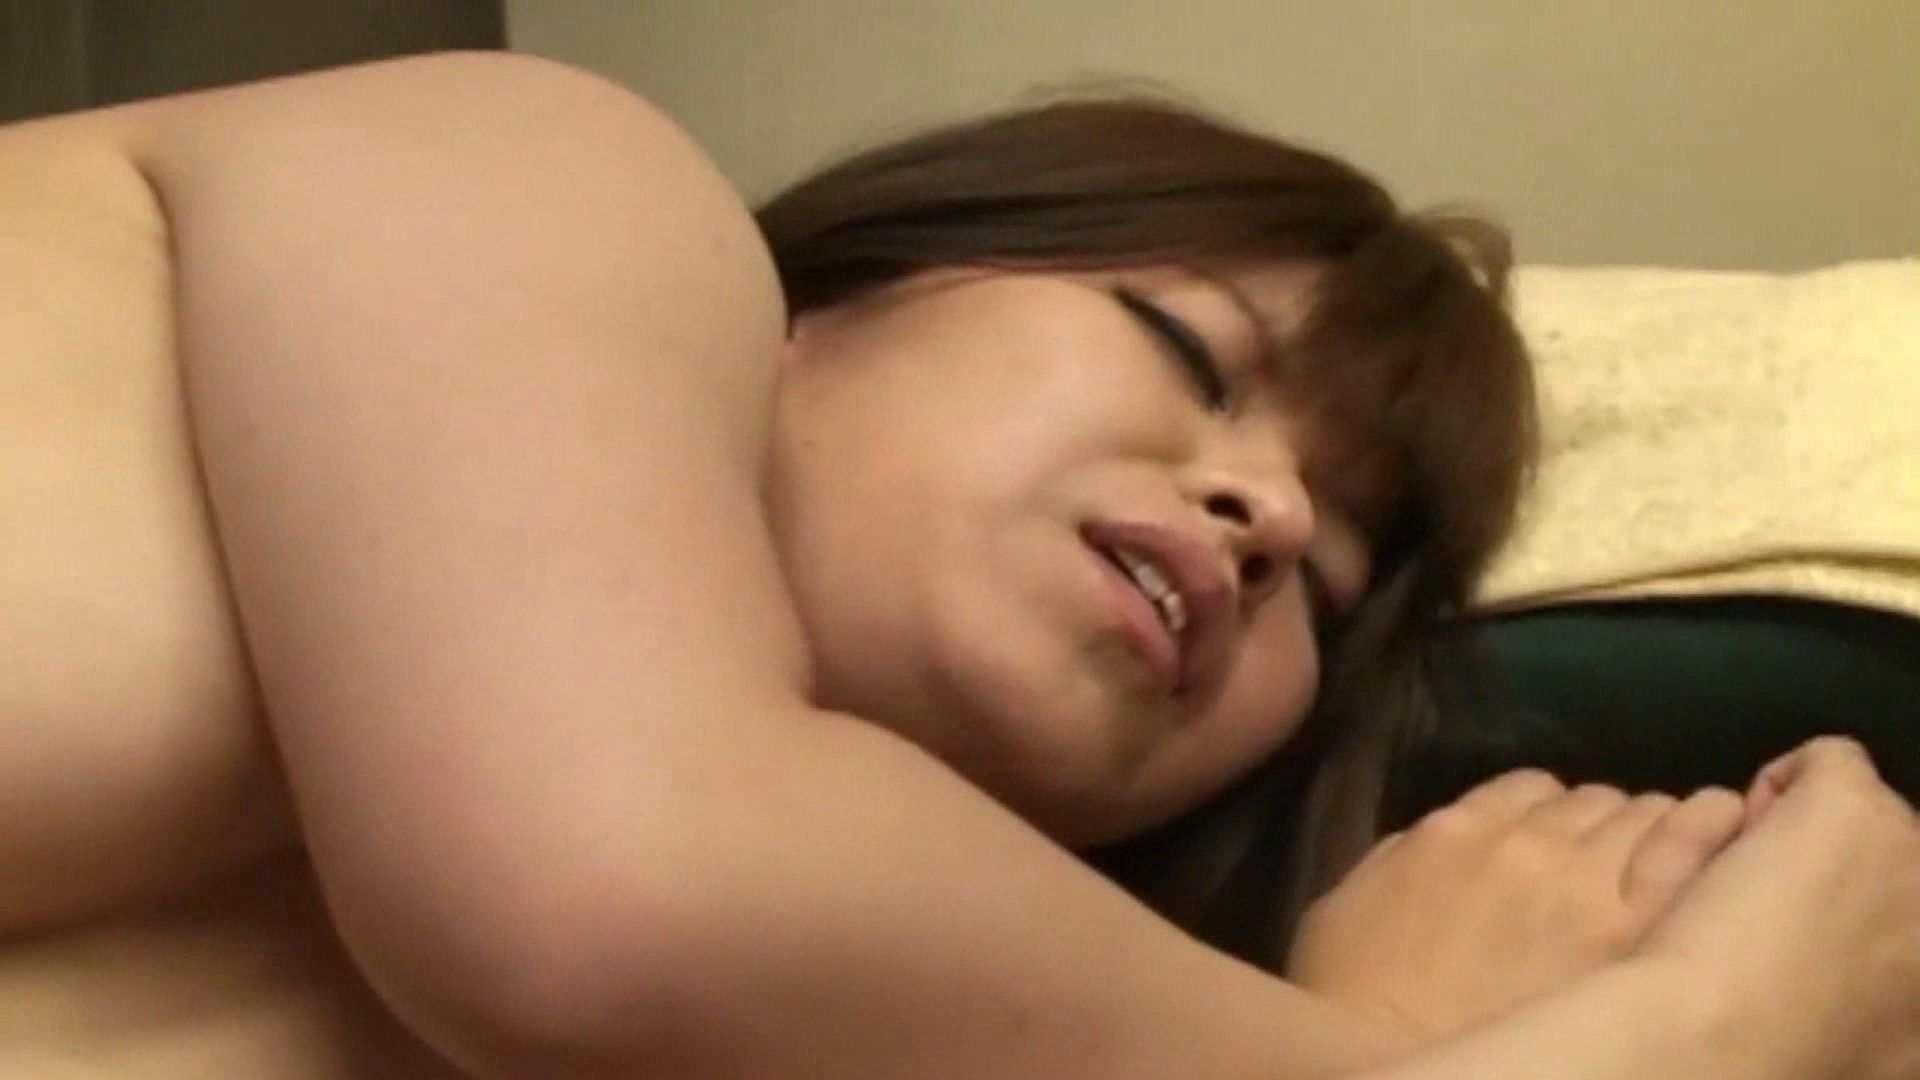 S級厳選美女ビッチガールVol.15 美女ヌード天国 のぞき動画画像 83PIX 47